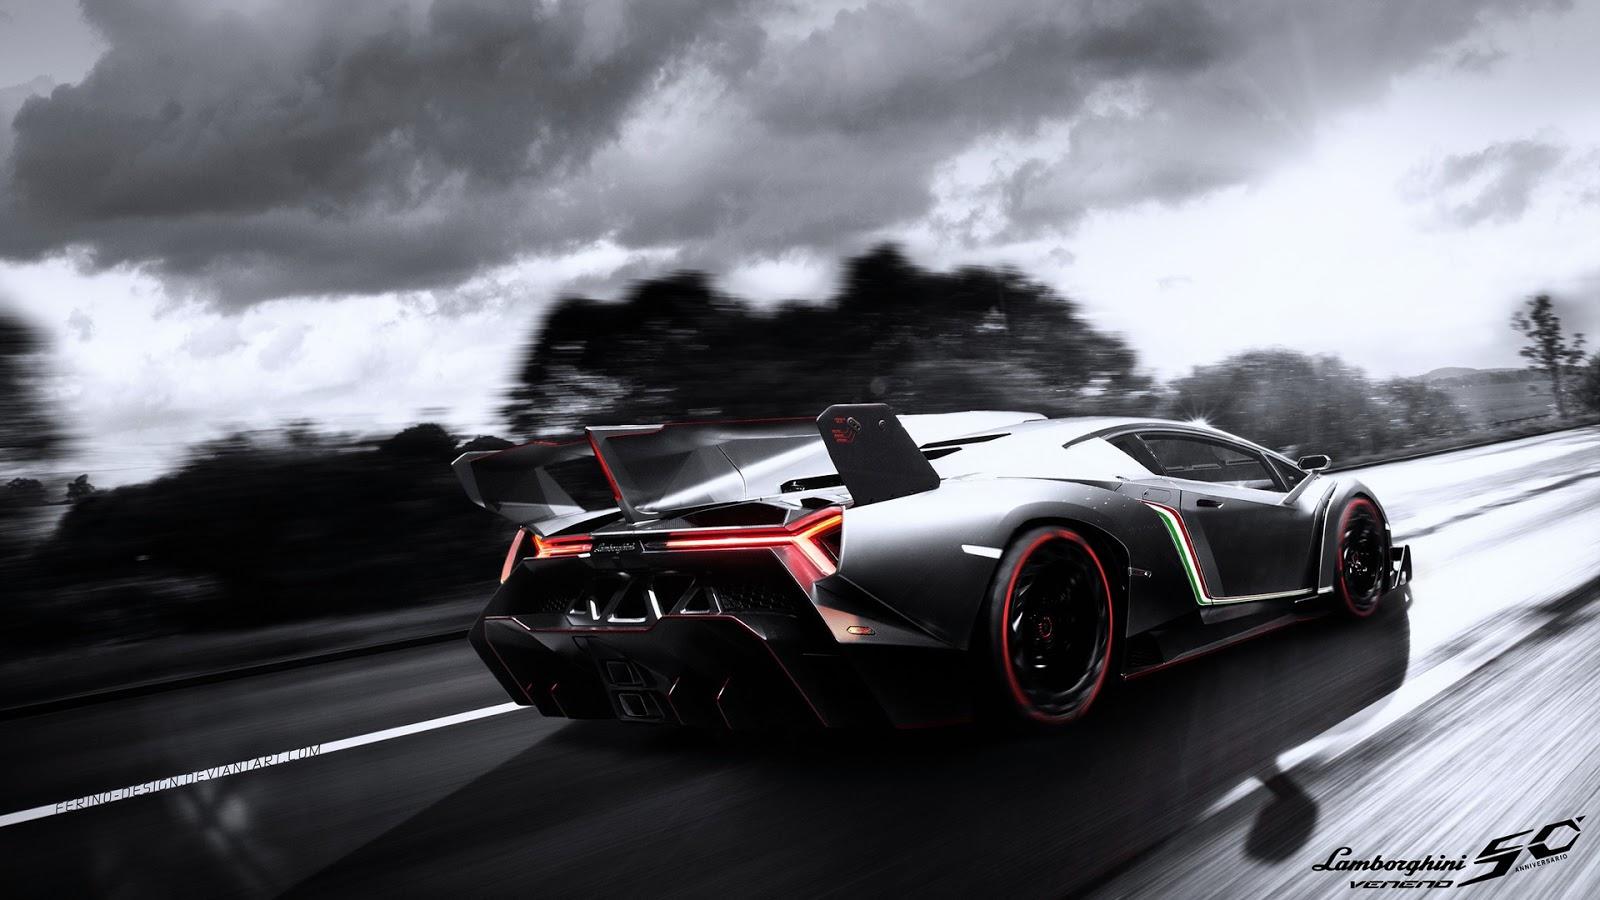 Lamborghini Wallpaper HD Running on Road